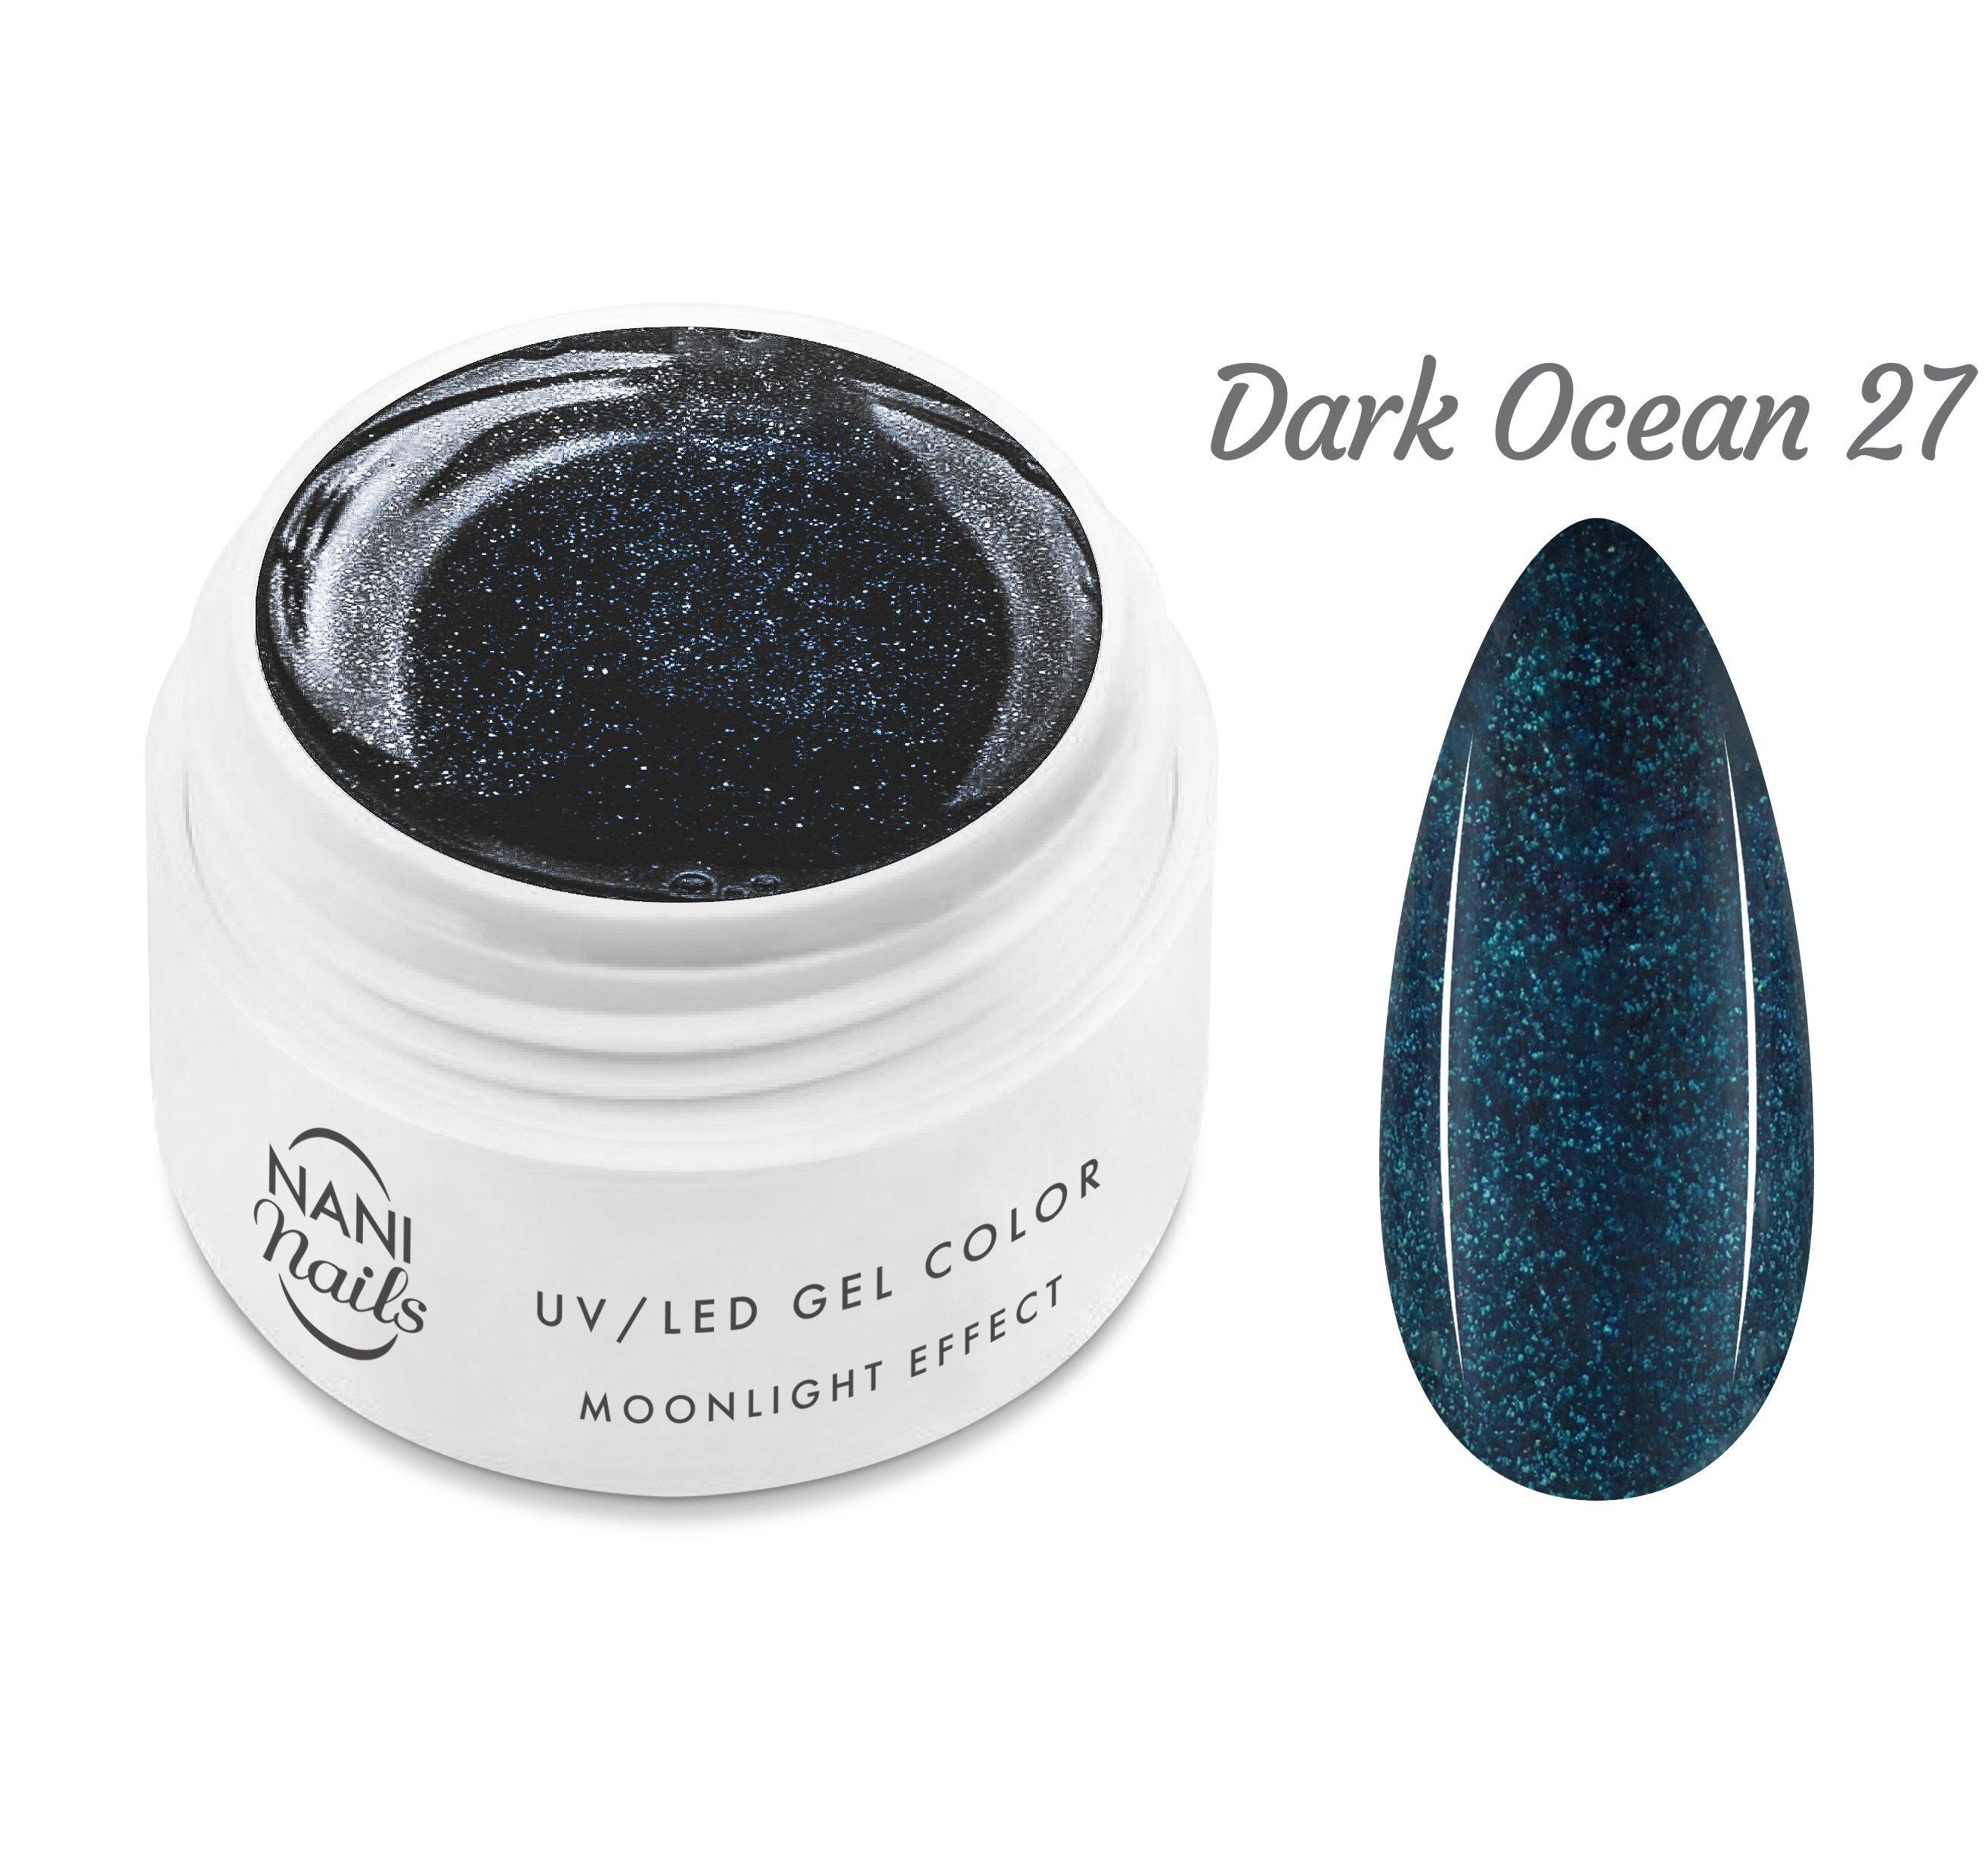 NANI UV gél Moonlight Effect 5 ml - Dark Ocean